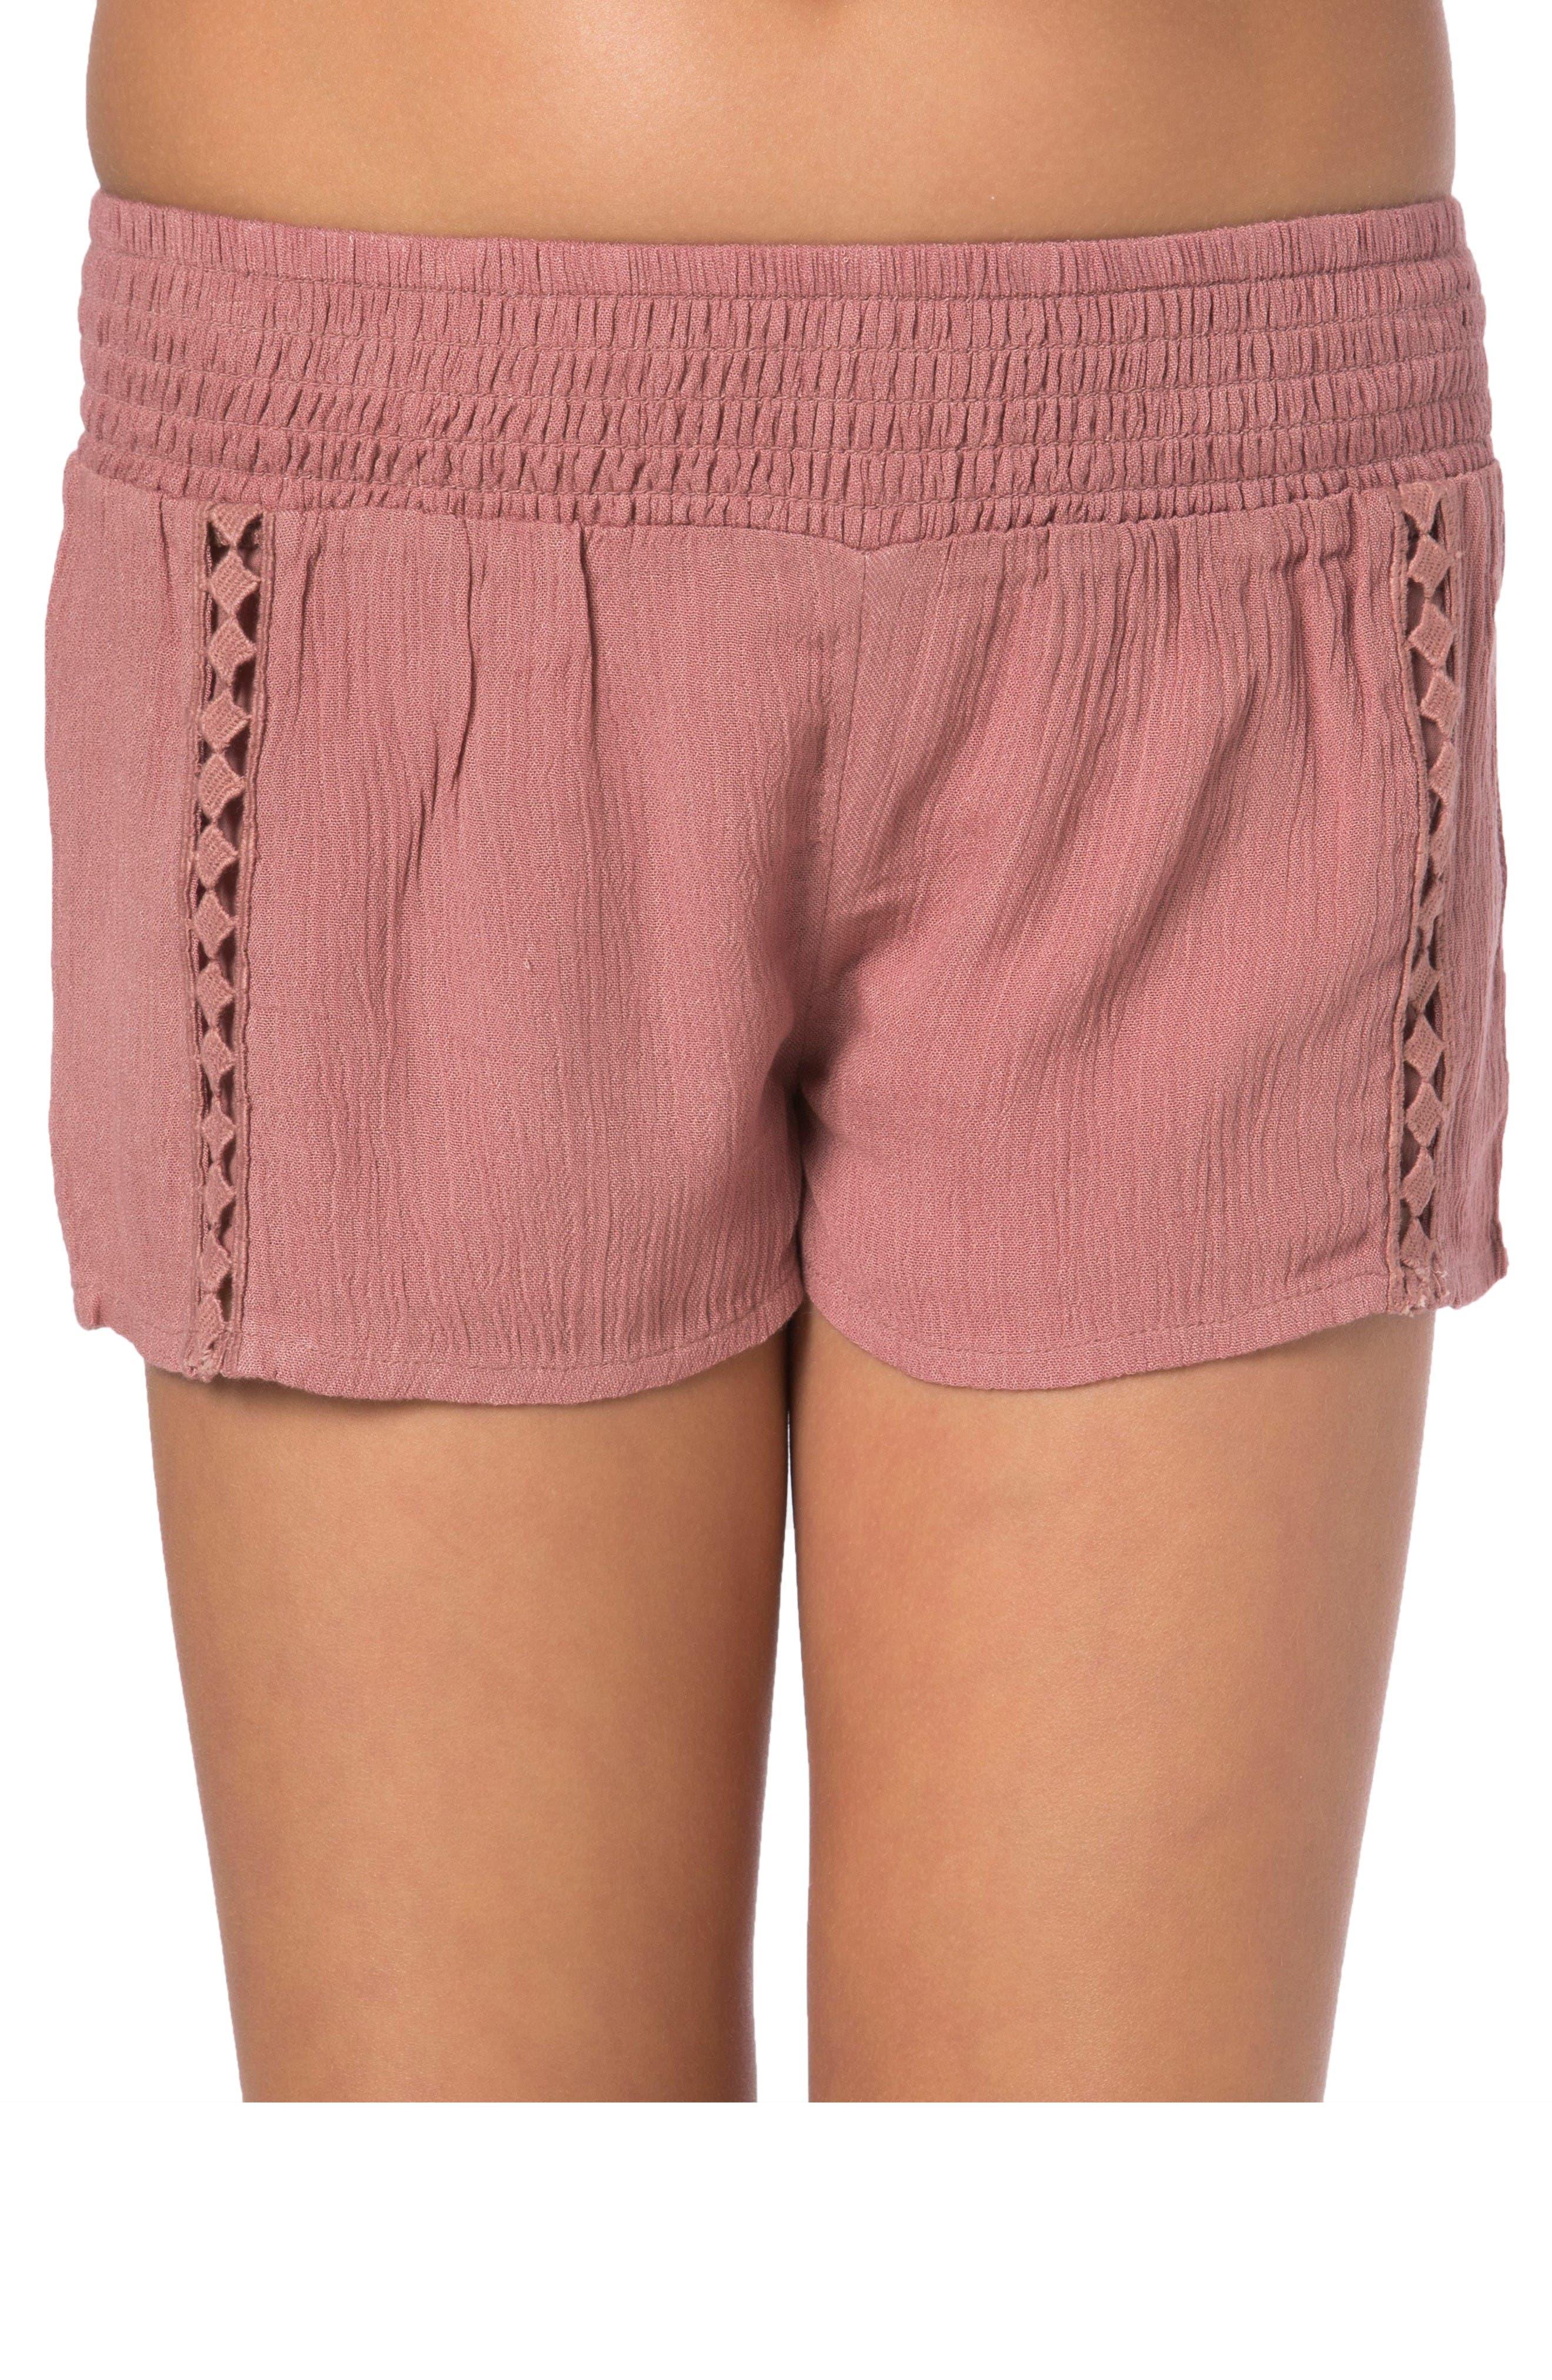 O'NEILL Elsa Shorts